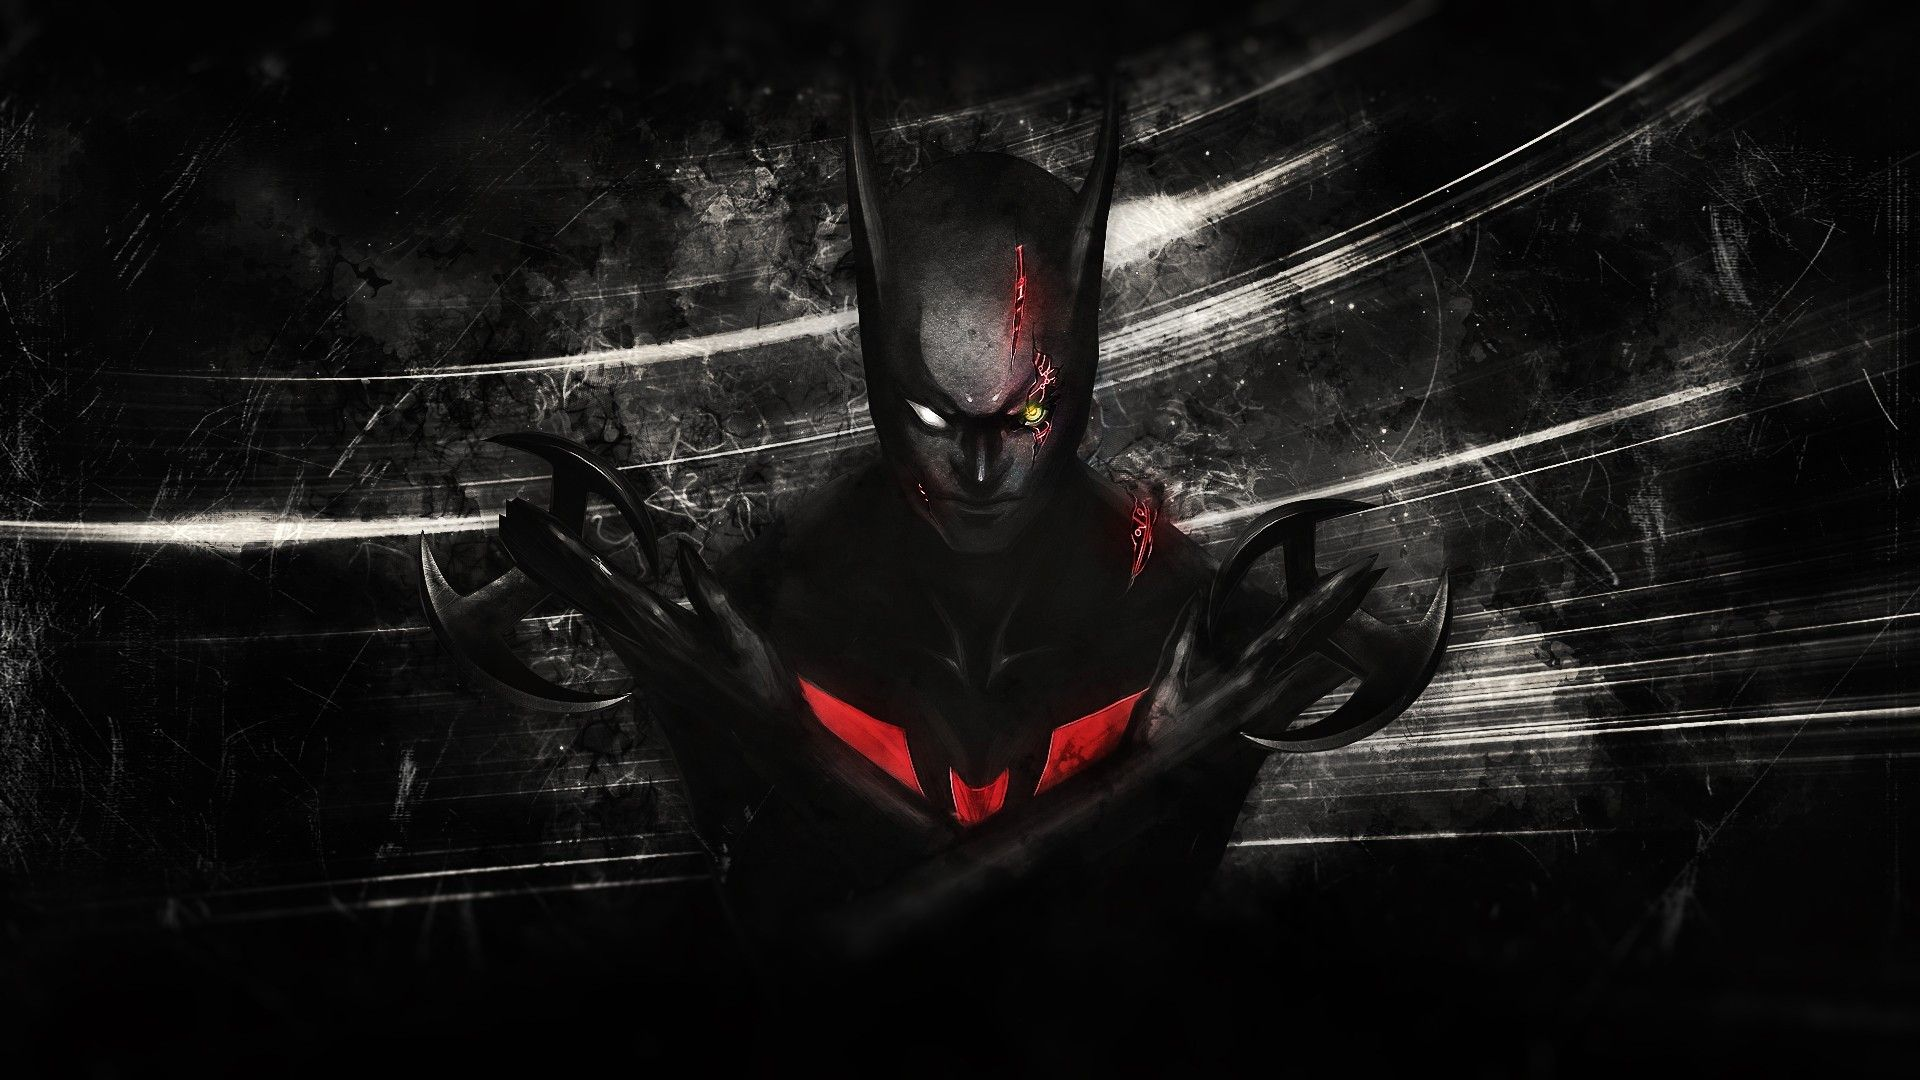 Superheroes Minimalistic Hi Res Wallpapers Batman Wallpaper Cool Batman Wallpapers Hd Batman Wallpaper